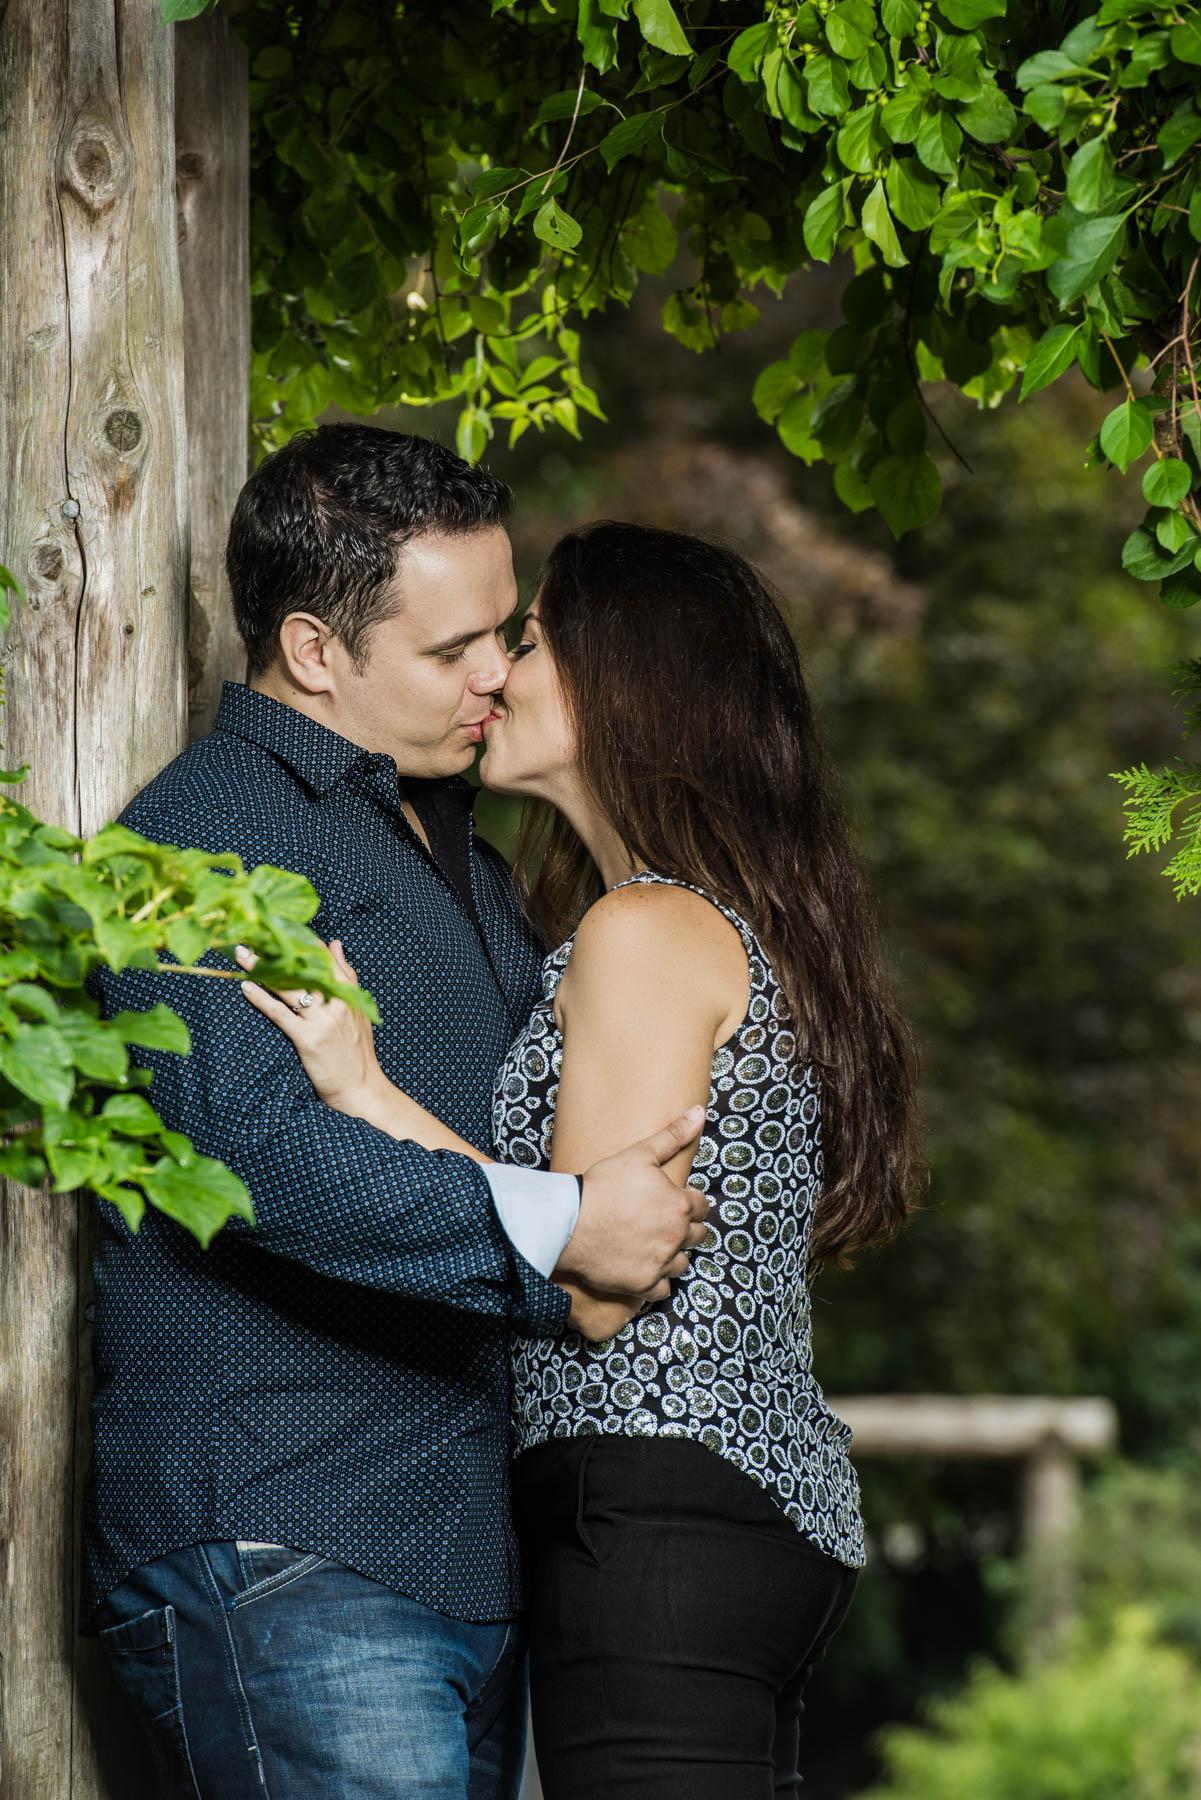 008 - Engagement JJ Alexander Muir Memorial Gardens